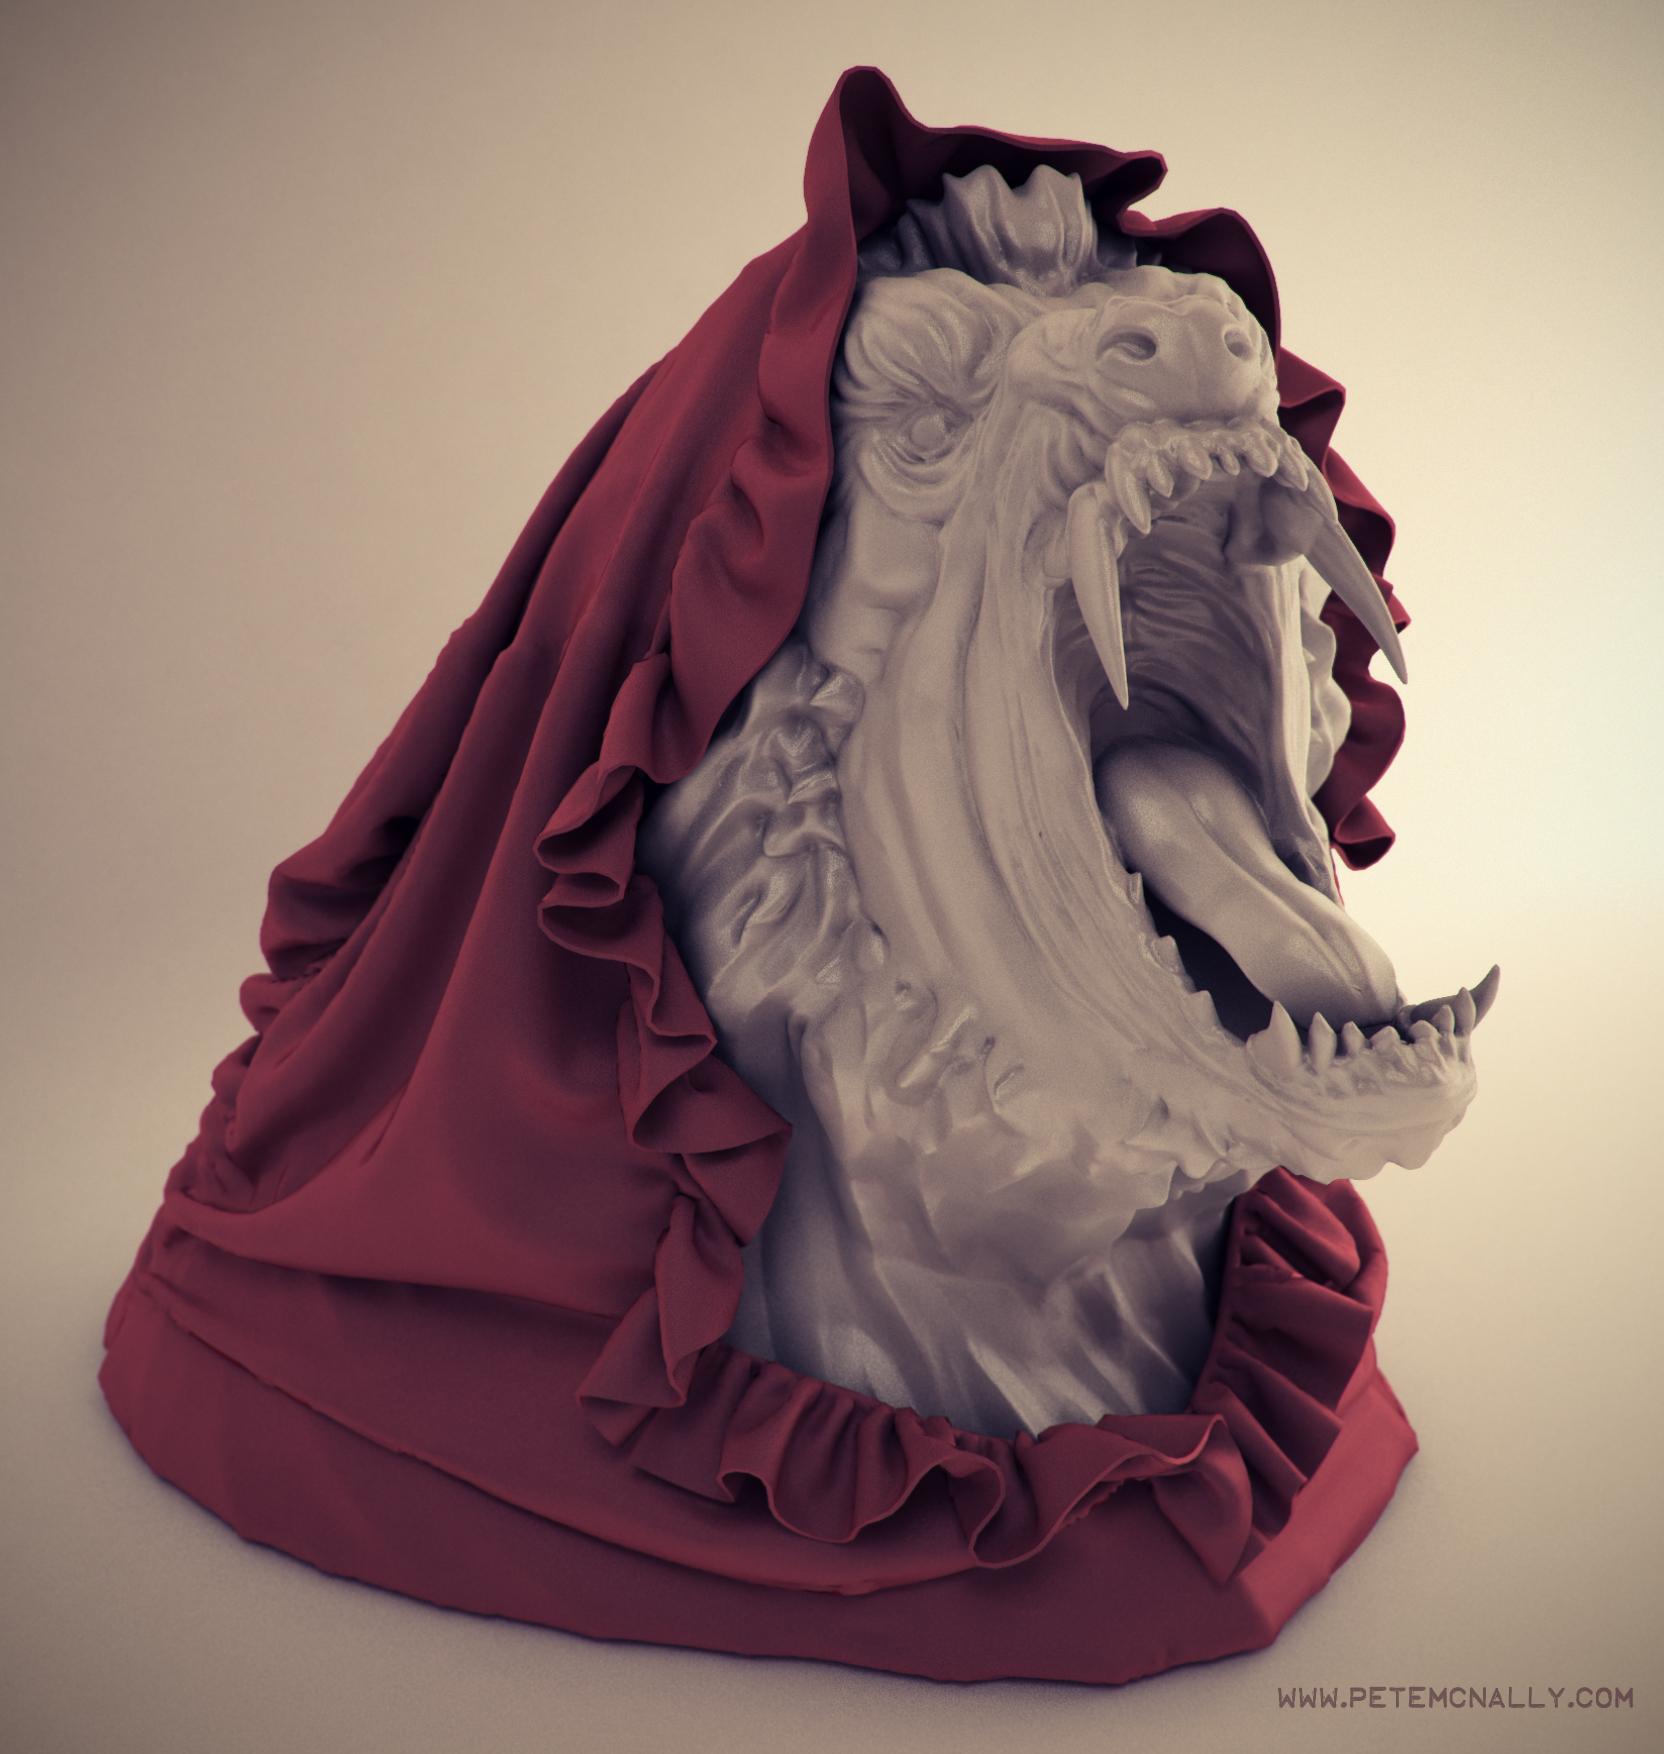 petemcnally_redwolf_blog.jpg